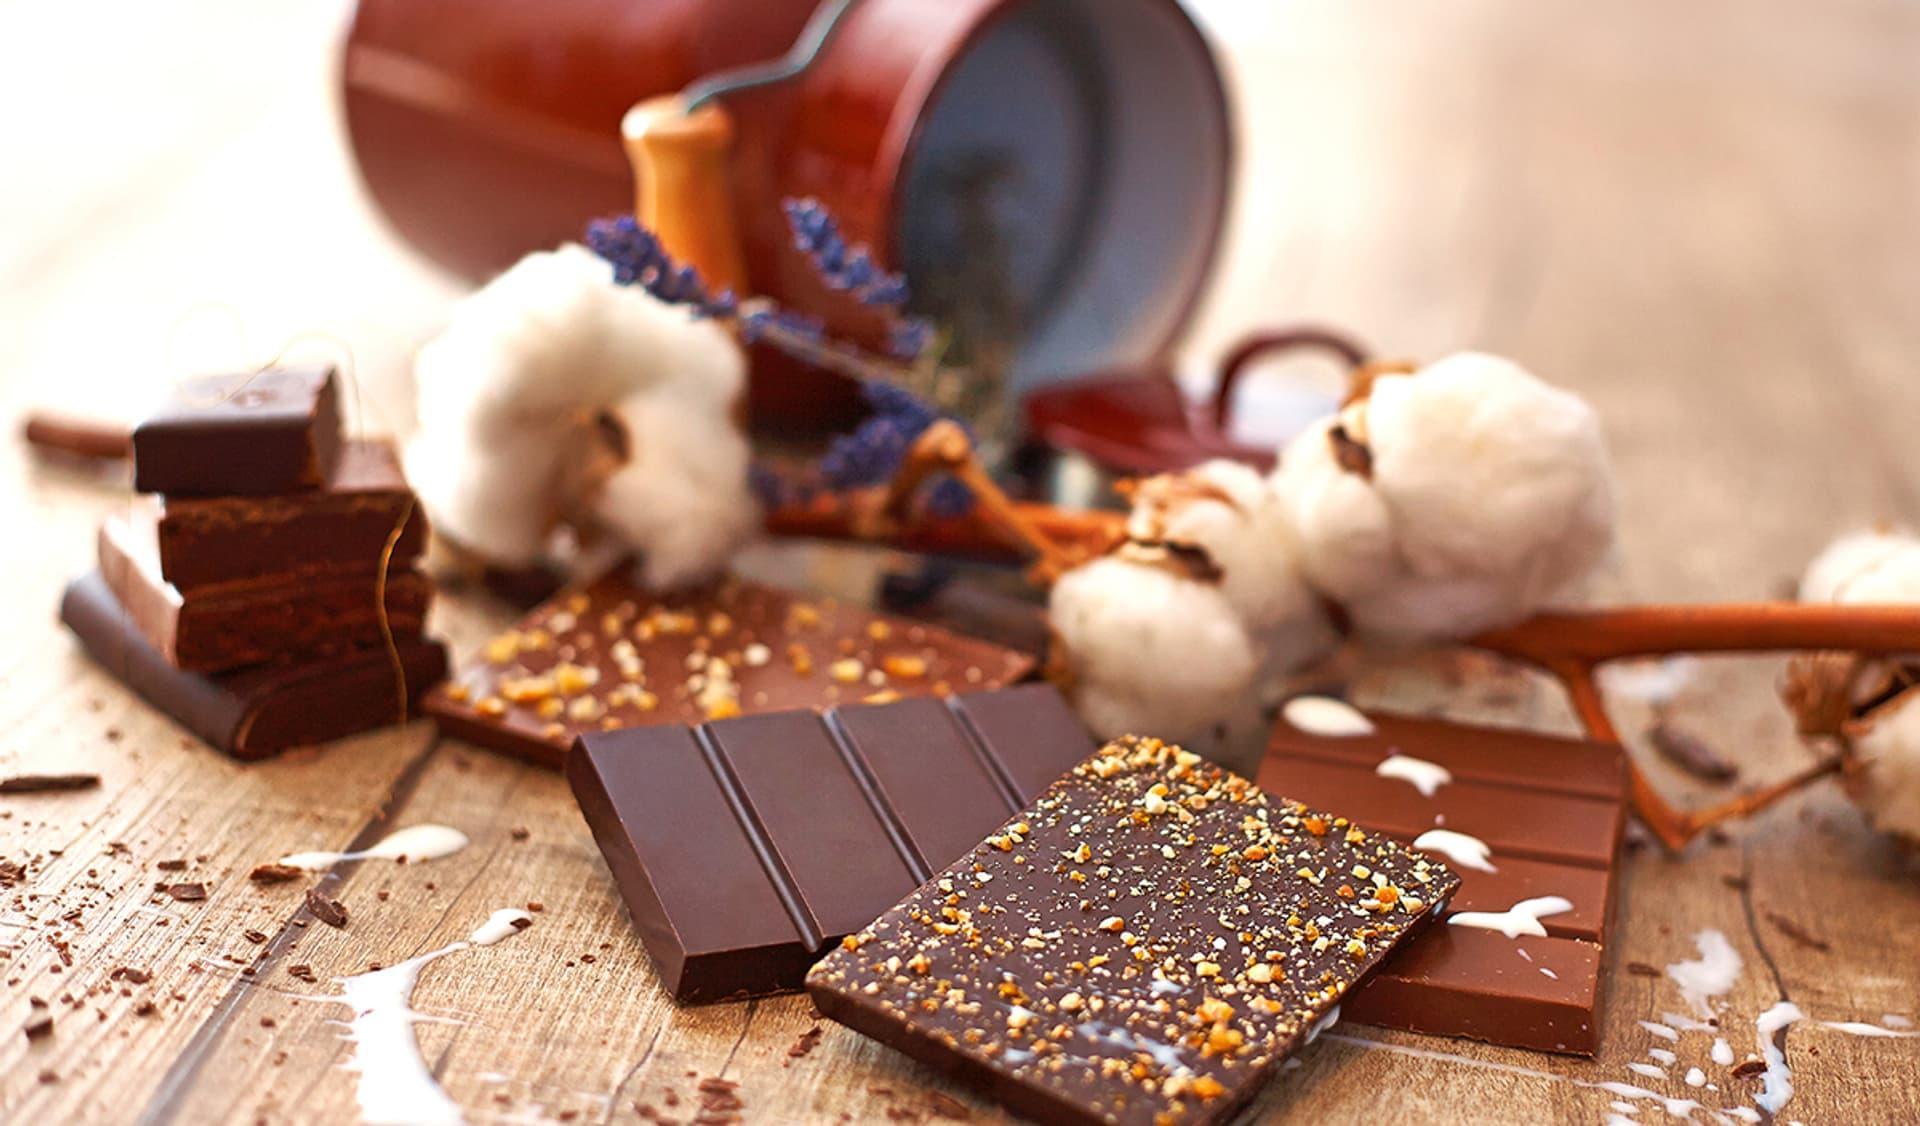 Schokolade von Styx Naturcosmetic